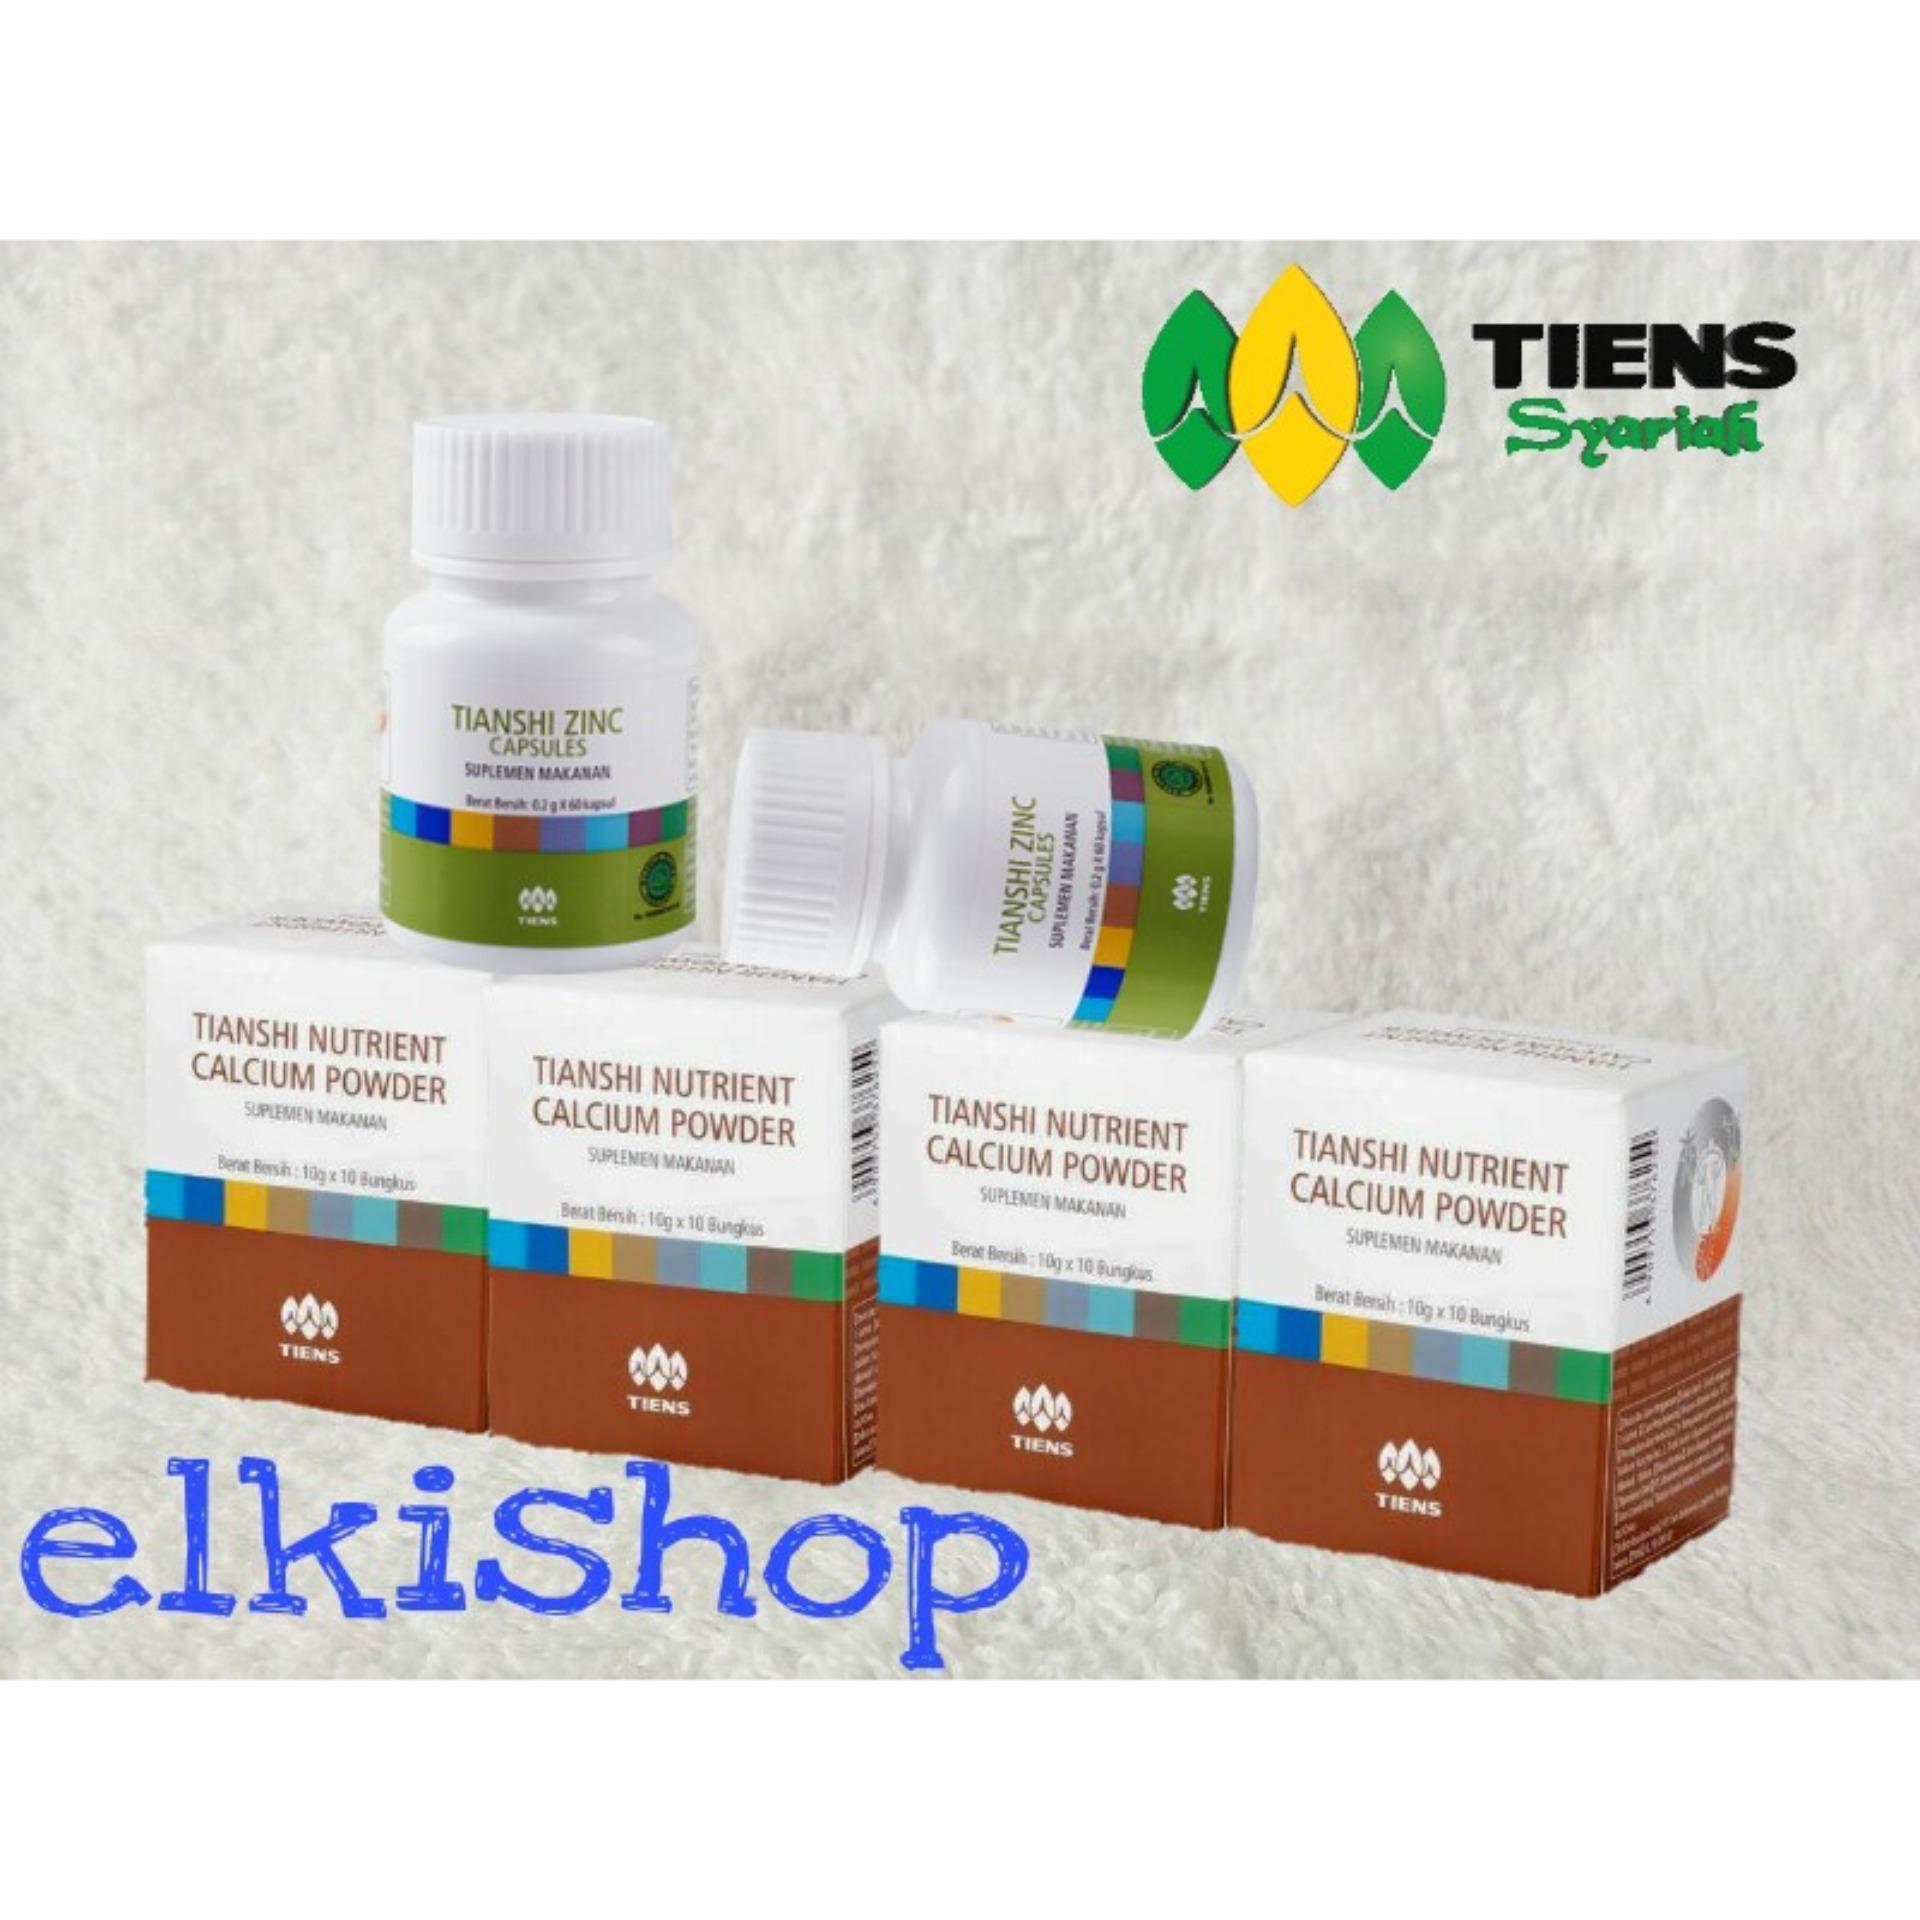 Tiens Paket Peninggi Badan 32 3 Box Nutrient Calcium Powder Tianshi Silver Zinc Nhcp Kalsium Dewasa Herbal Ab1 Terbaik Di Dunia 4 High